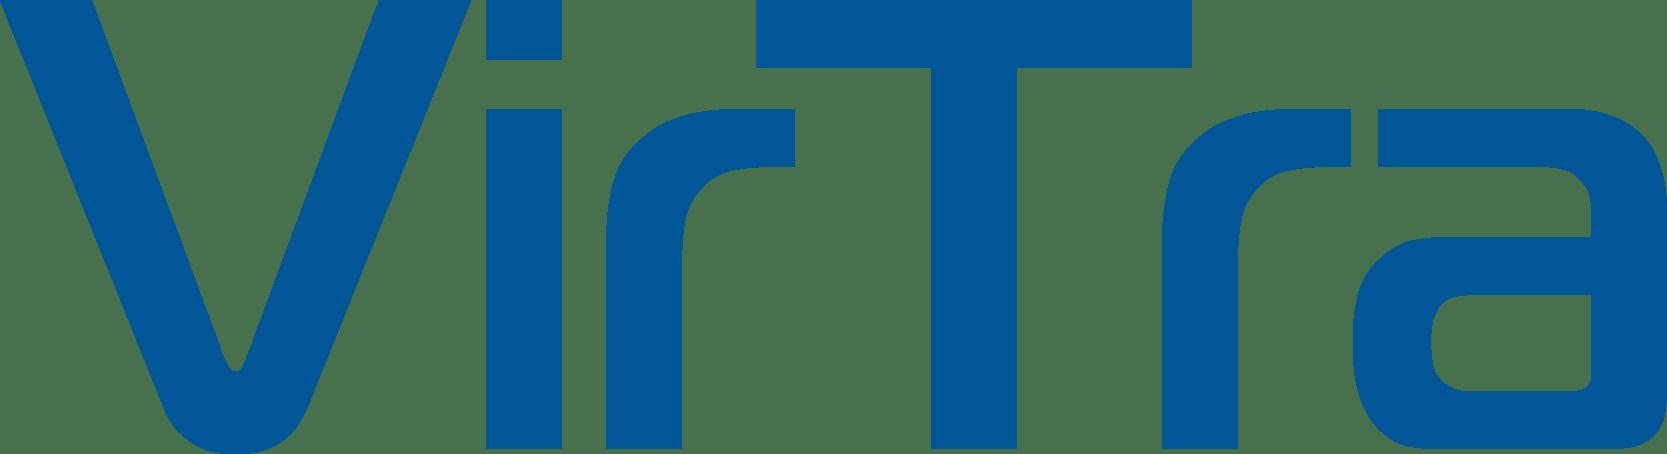 VirTra Logo Blue